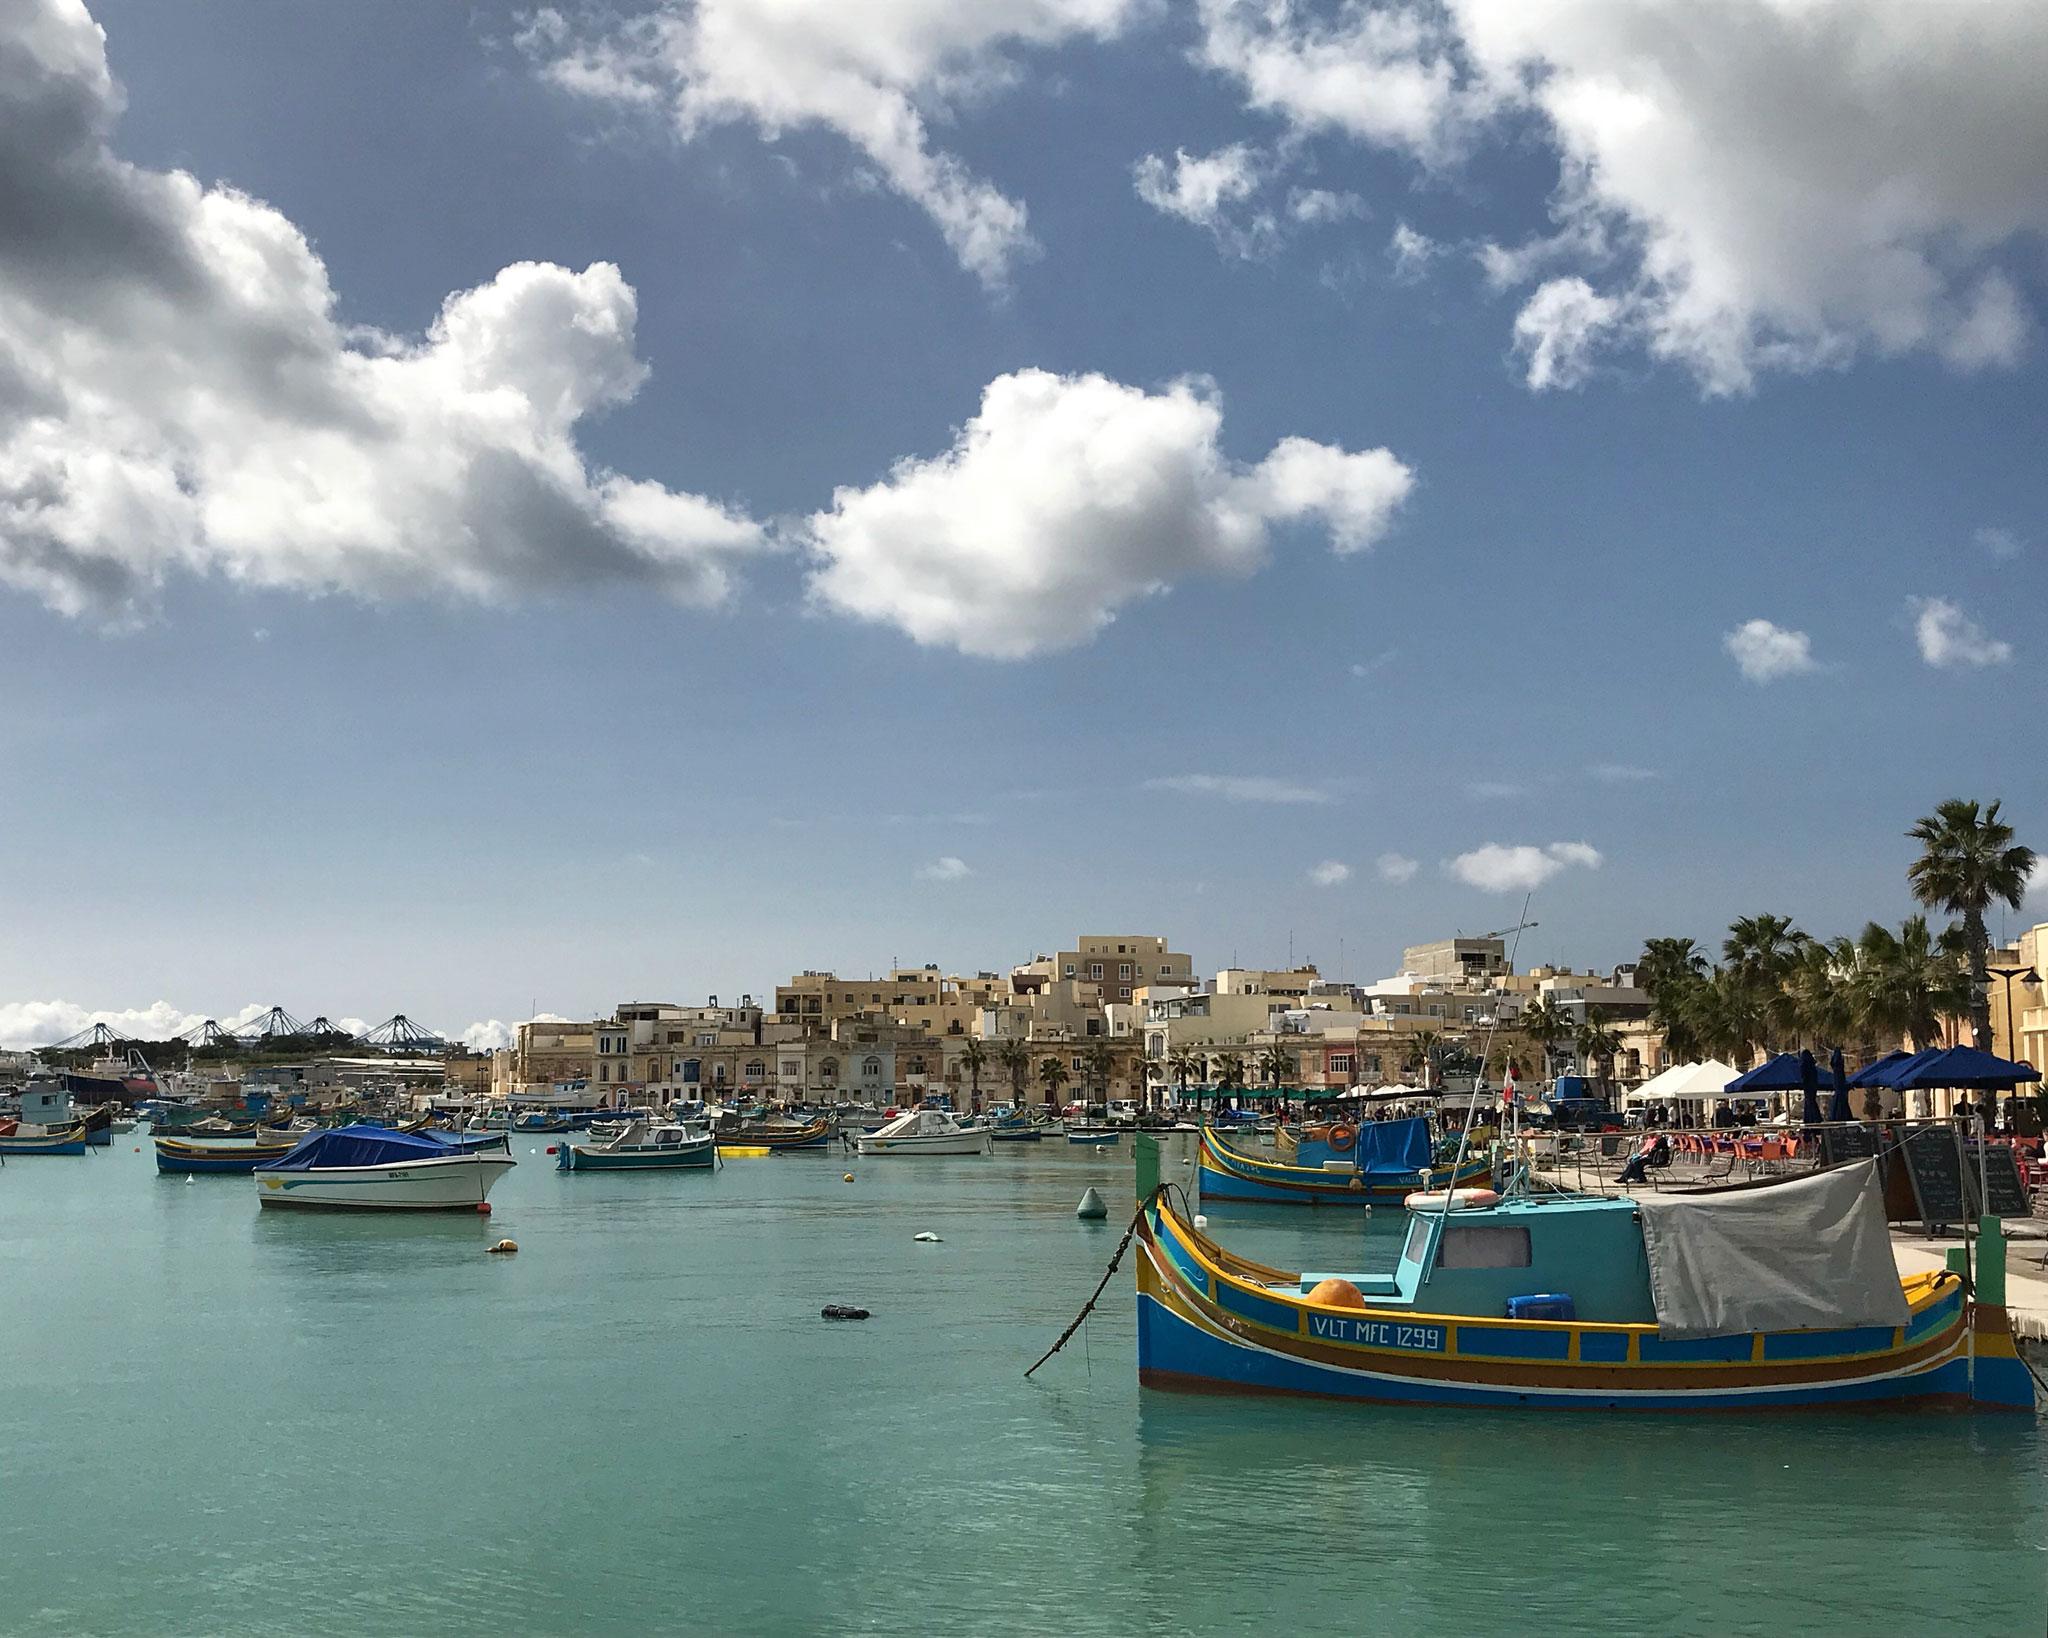 Marsaxlokk-Malta-mare-cielo-nuvole-luzzu-colorati